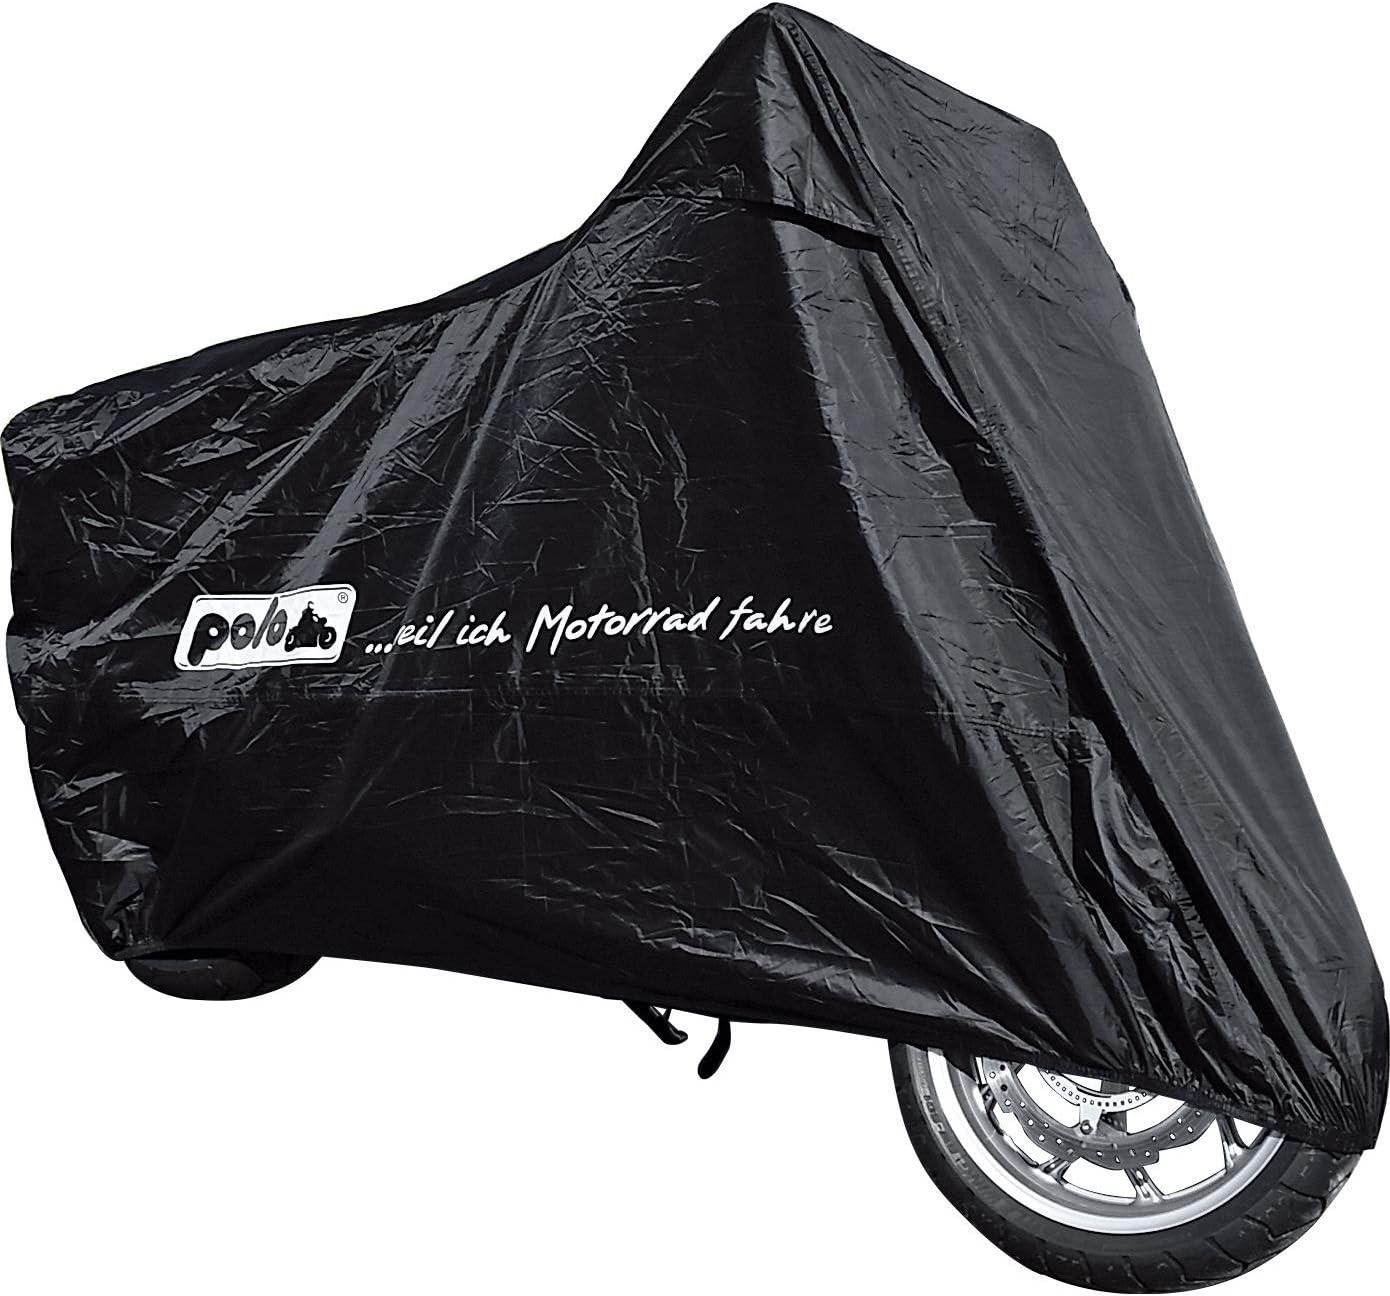 Polo Motorradabdeckung Motorradplane Motorradgarage Outdoor Abdeckplane Superdeal Universal 240 140 93 Cm Unisex Multipurpose Ganzjährig Schwarz Auto